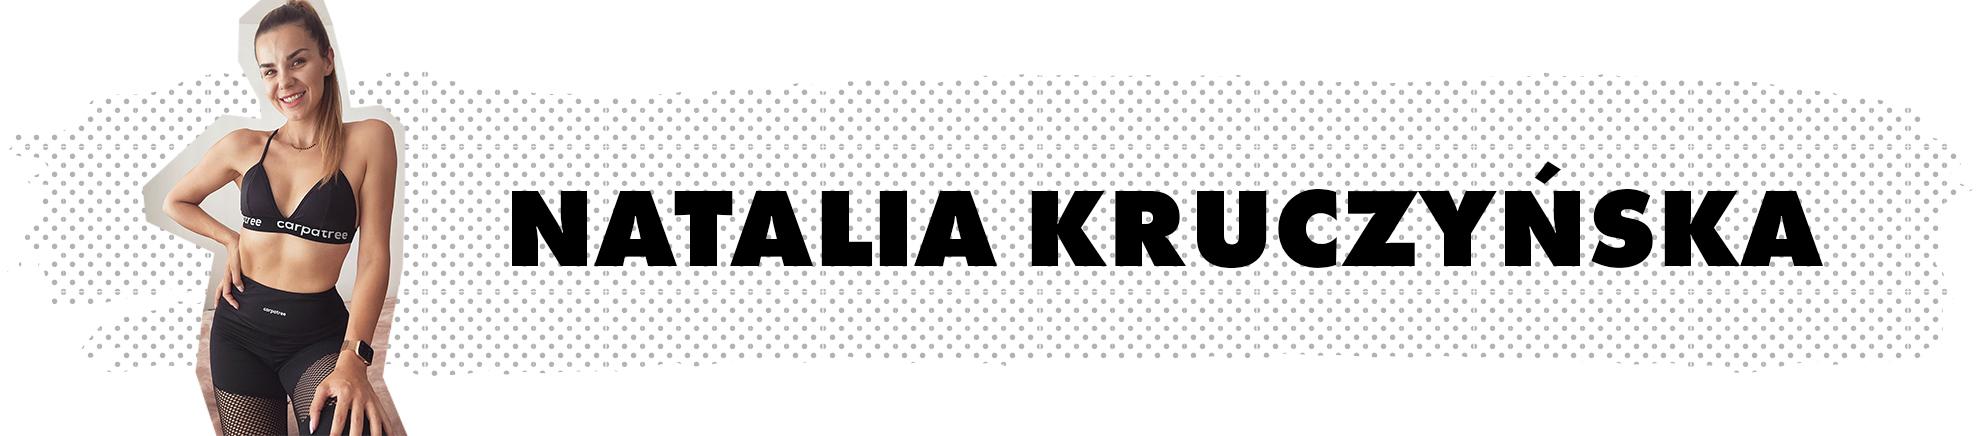 Natalia Kruczyńska - Carpatree brand ambassador